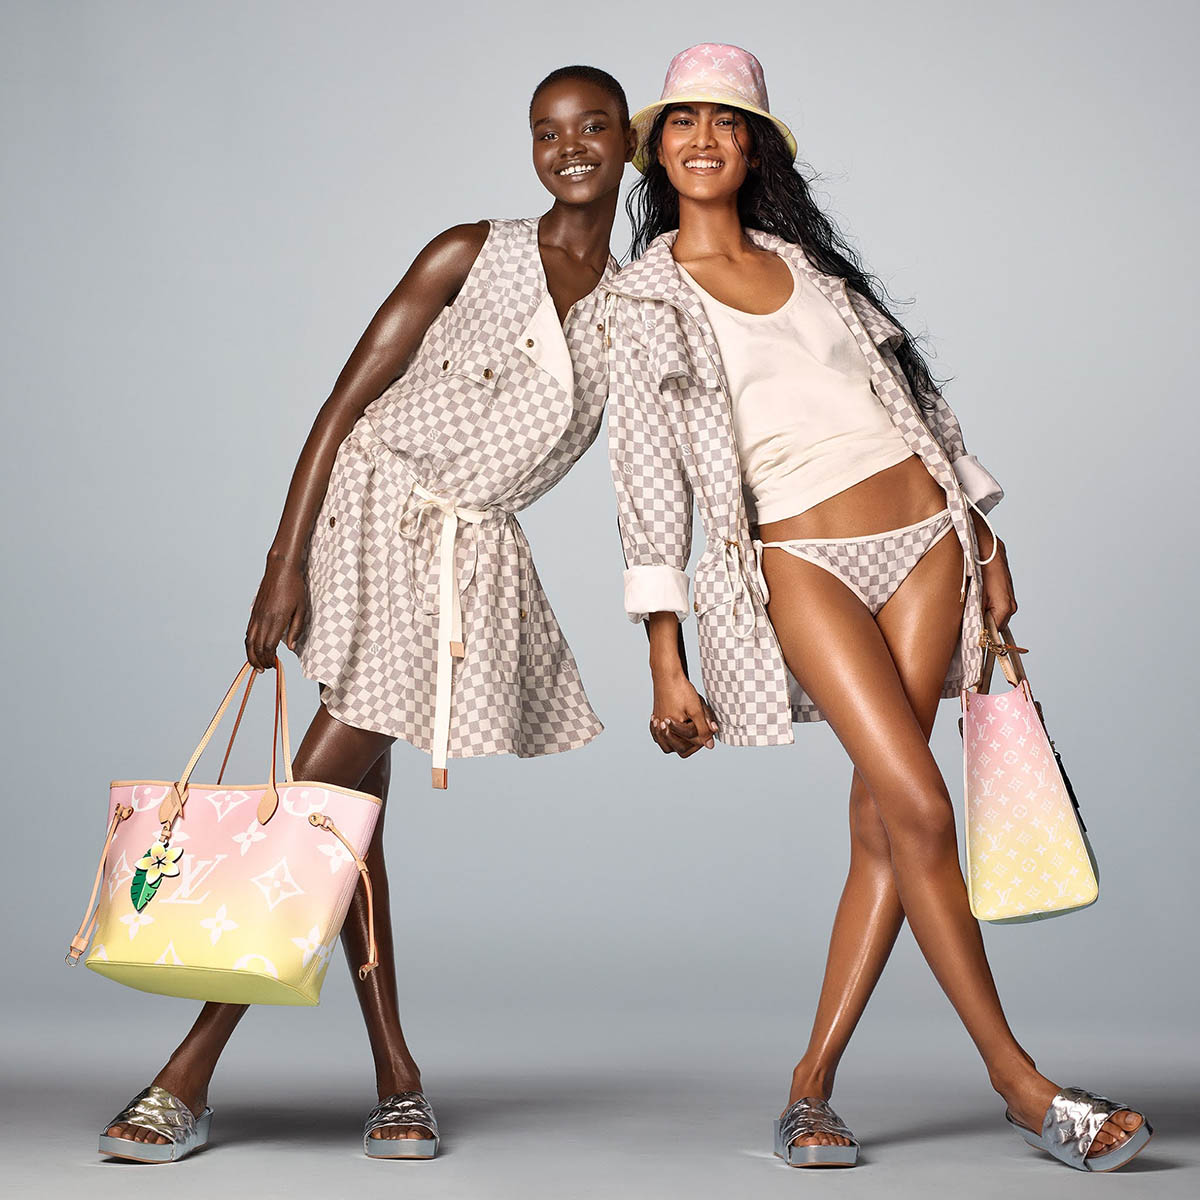 Louis Vuitton Summer 2021 Campaign